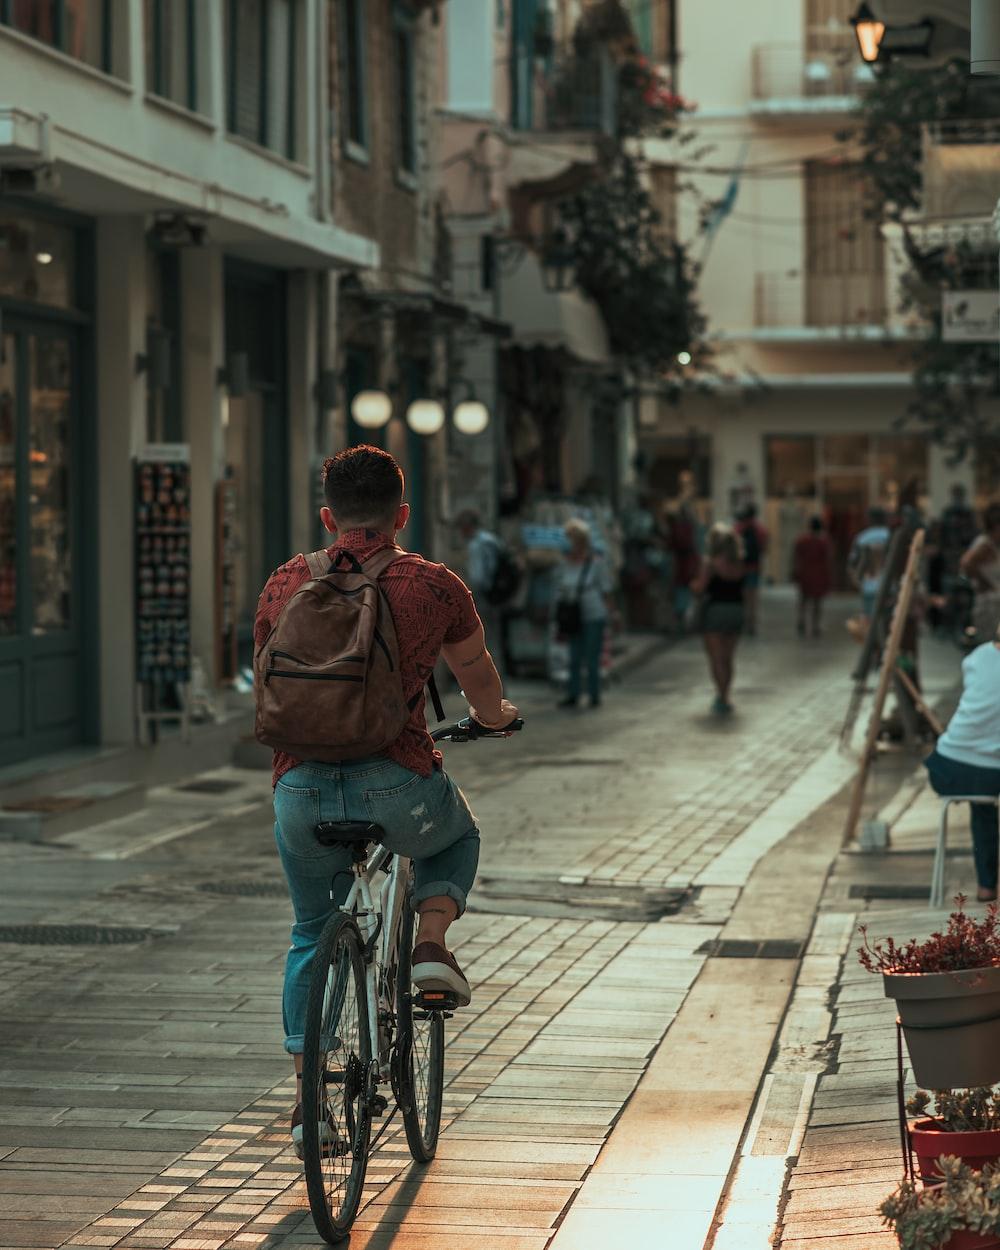 man in red jacket riding bicycle on street during daytime